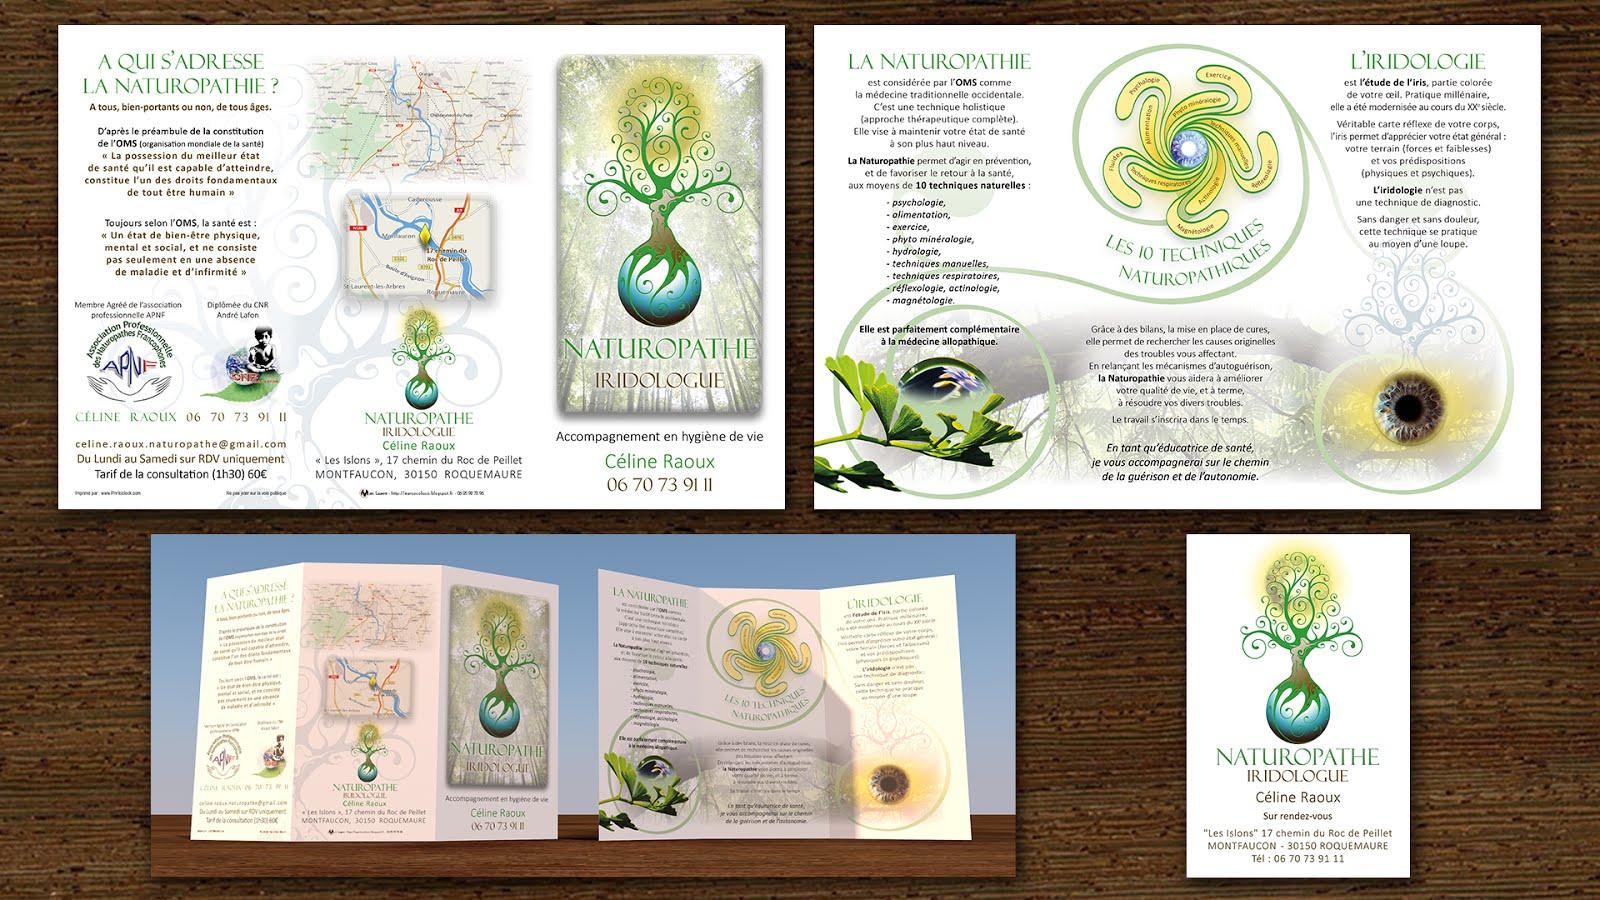 carte de visite naturopathe Dépliant & Carte de visite Naturopathe Iridologue Pour Céline